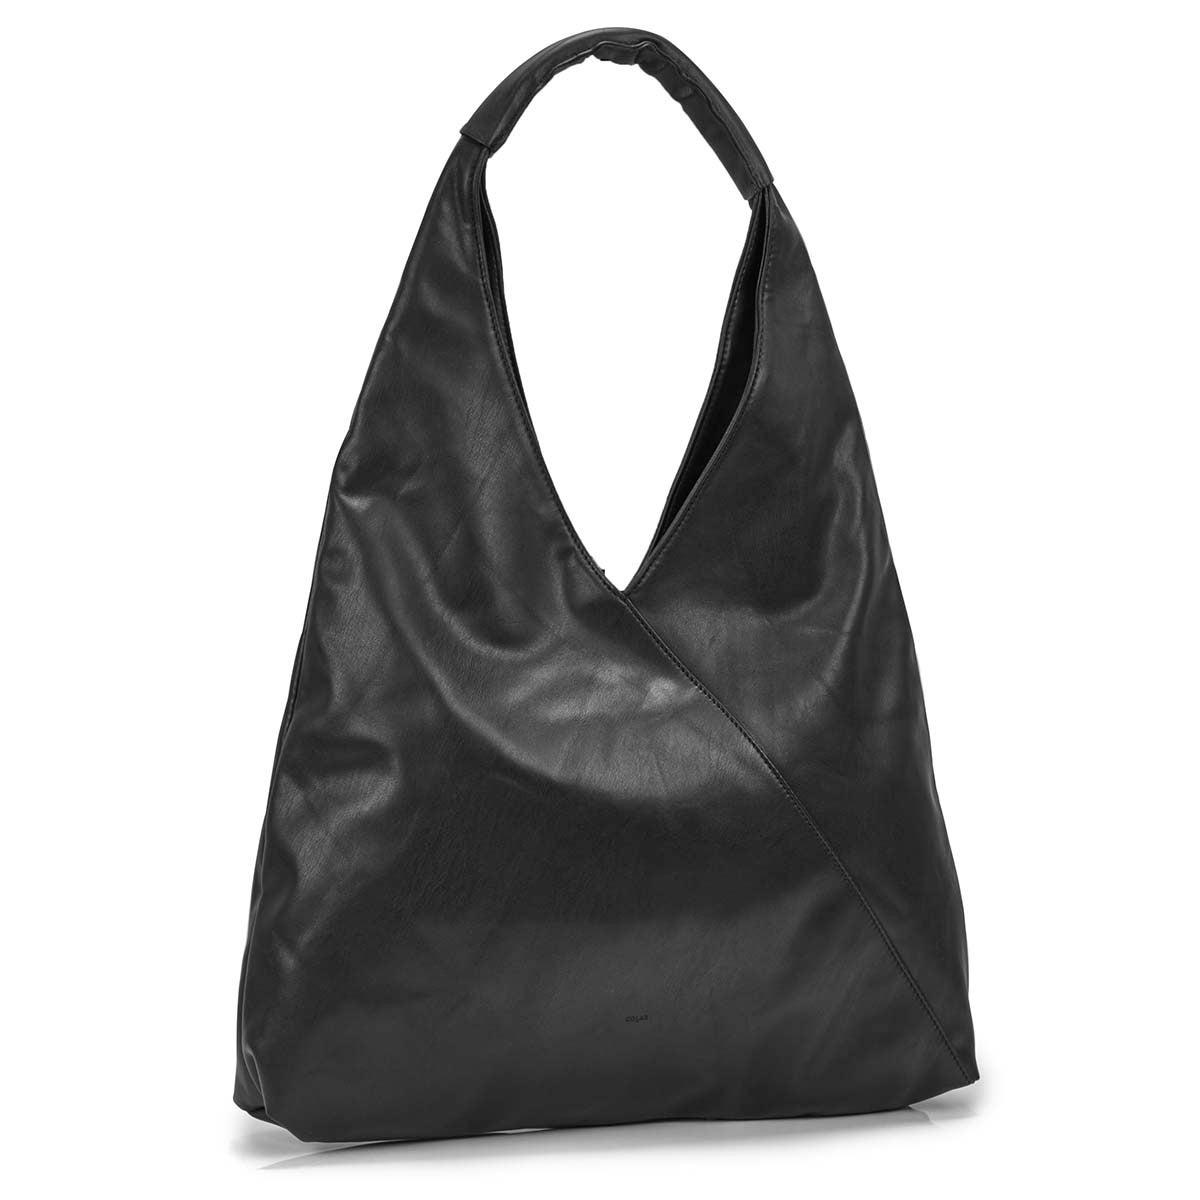 Women's ALEXIS black triangle hobo bag